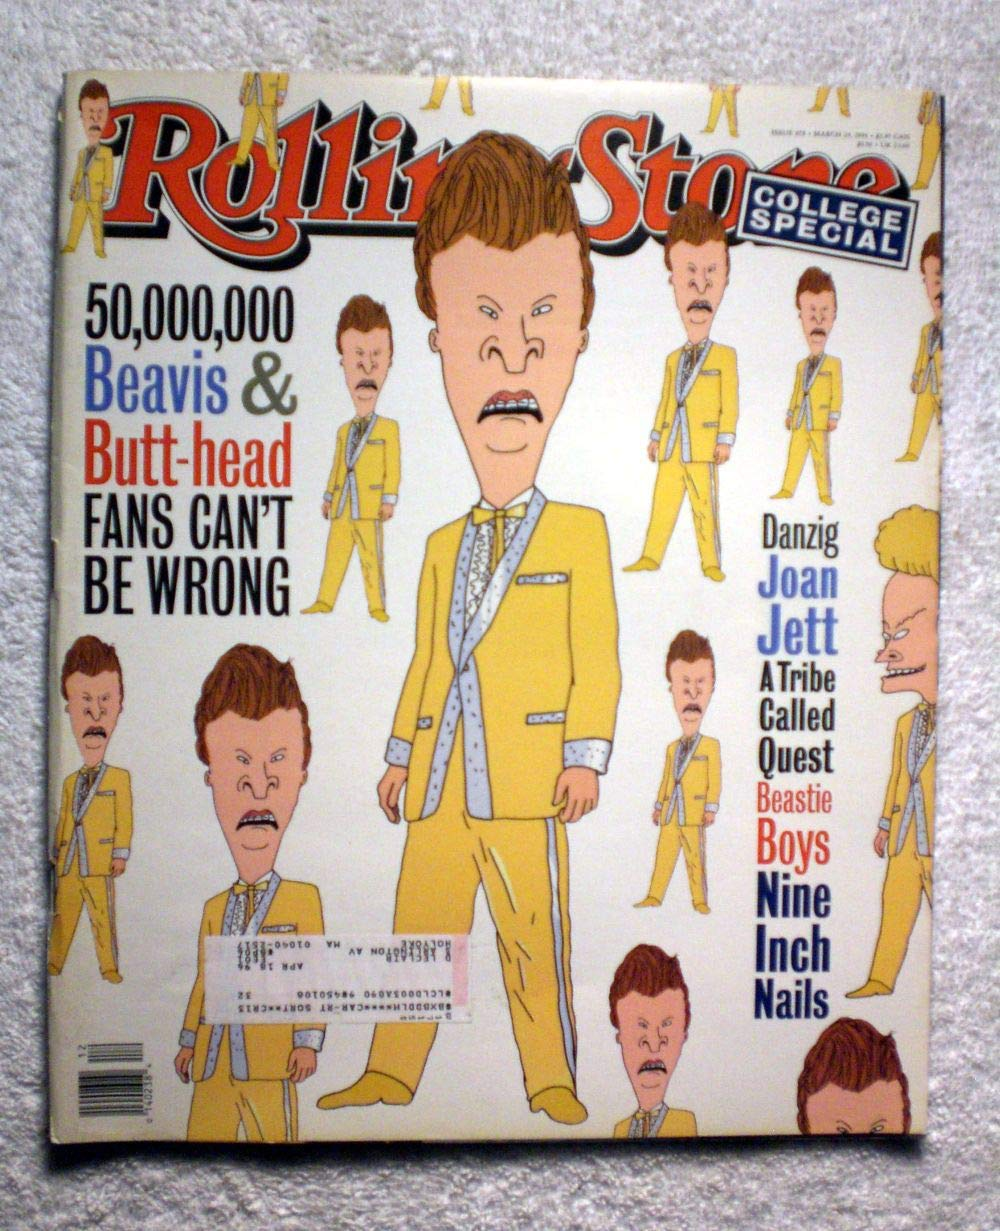 Beavis & Butt-Head (Mike Judge) - Rolling Stone Magazine - #678 - March 24, 1994 - Danzig, Joan Jett, A Tribe Called Quest articles Butthead